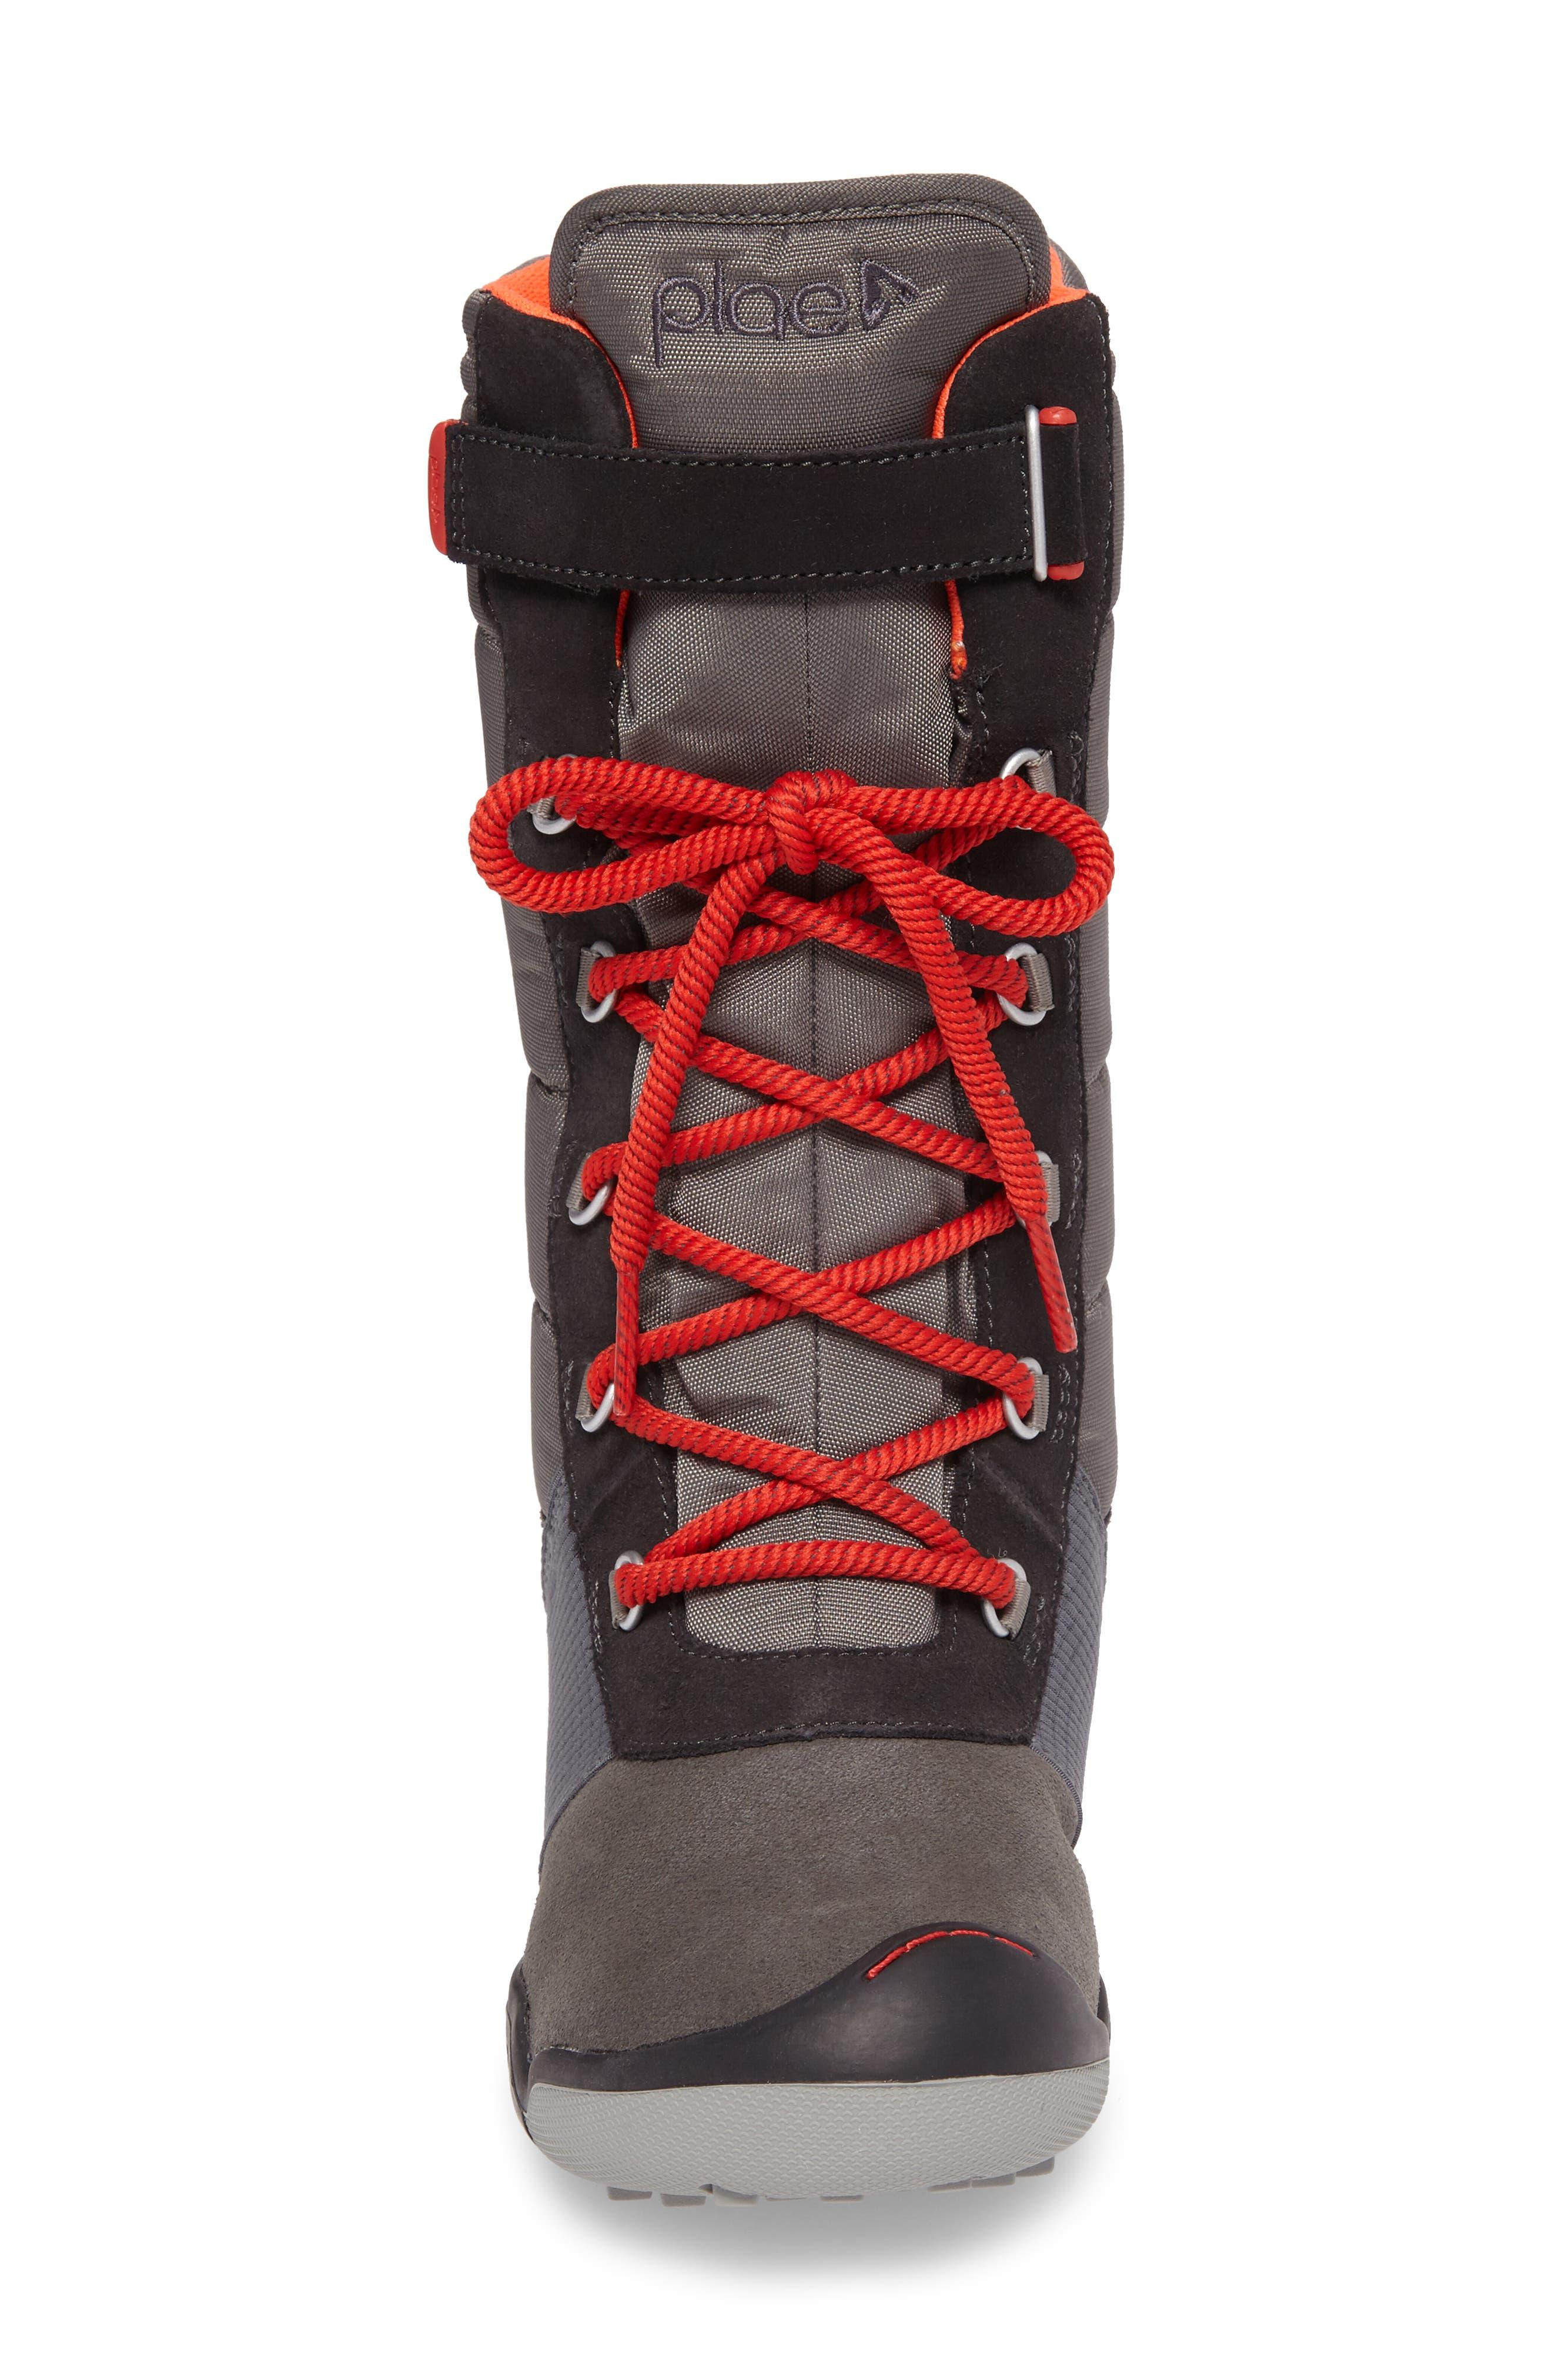 Jack Customizable Waterproof Boot,                             Alternate thumbnail 4, color,                             DARK